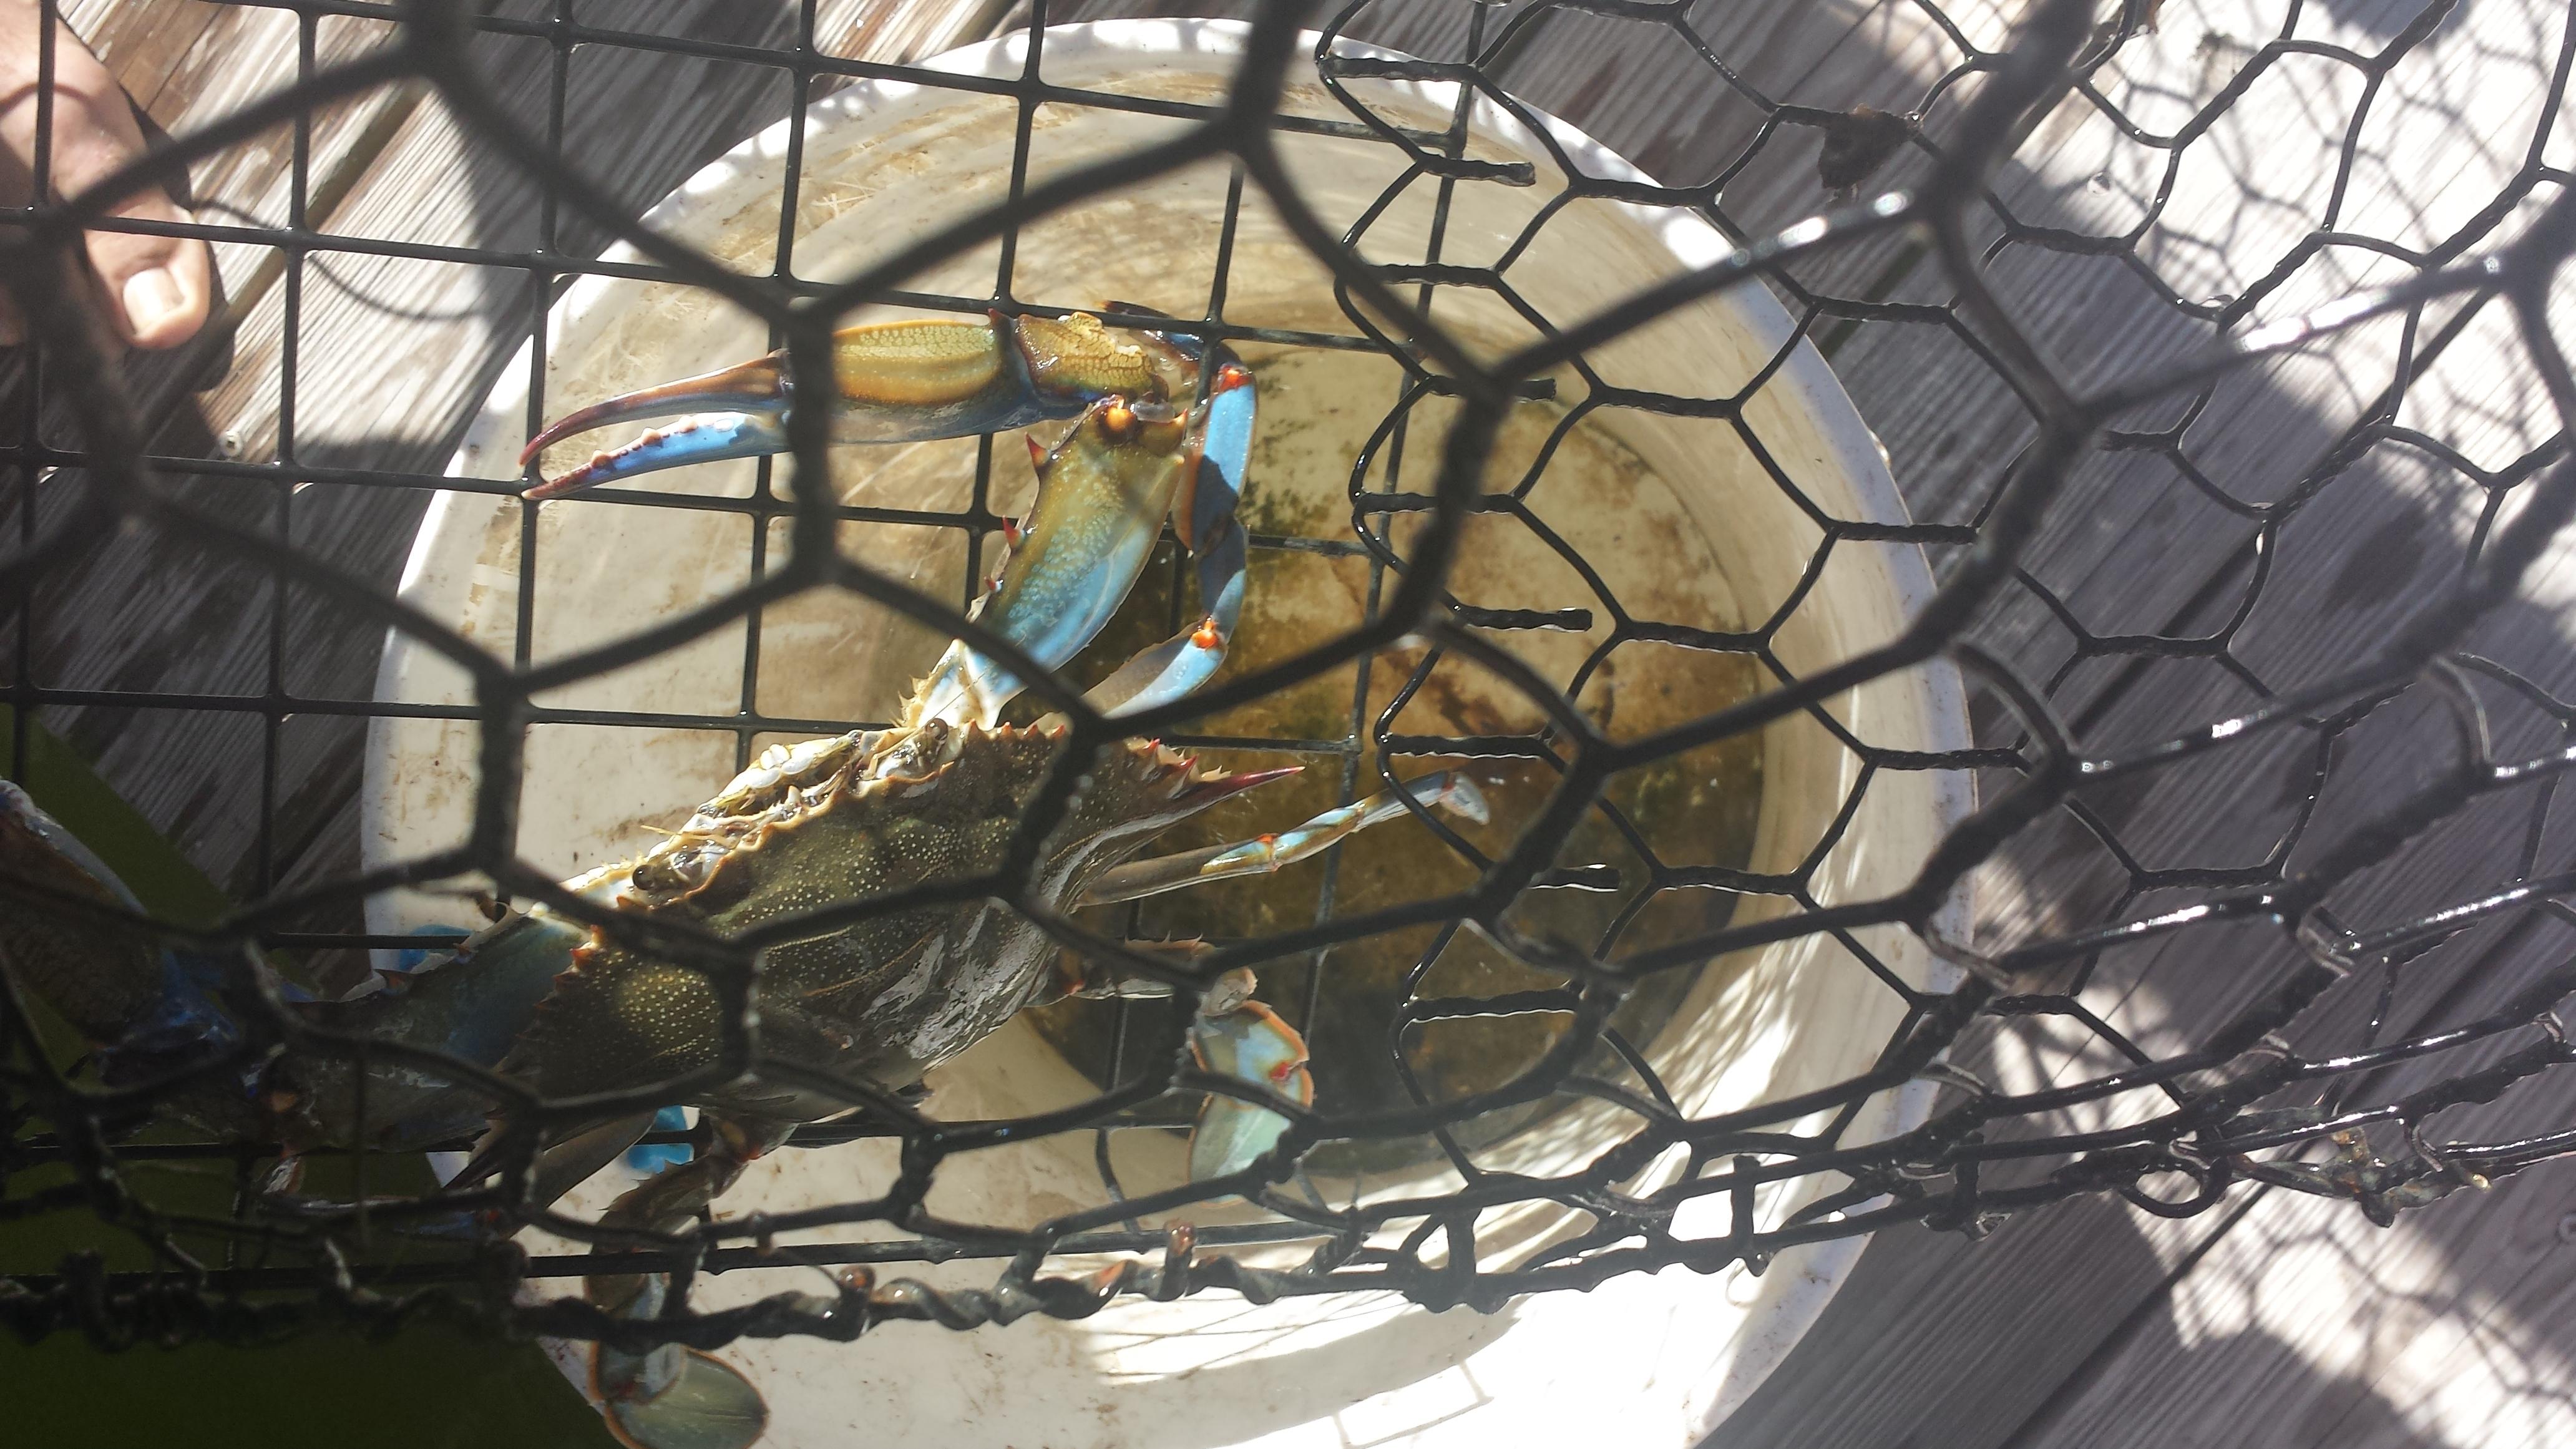 Freshly caught Florida blue crab